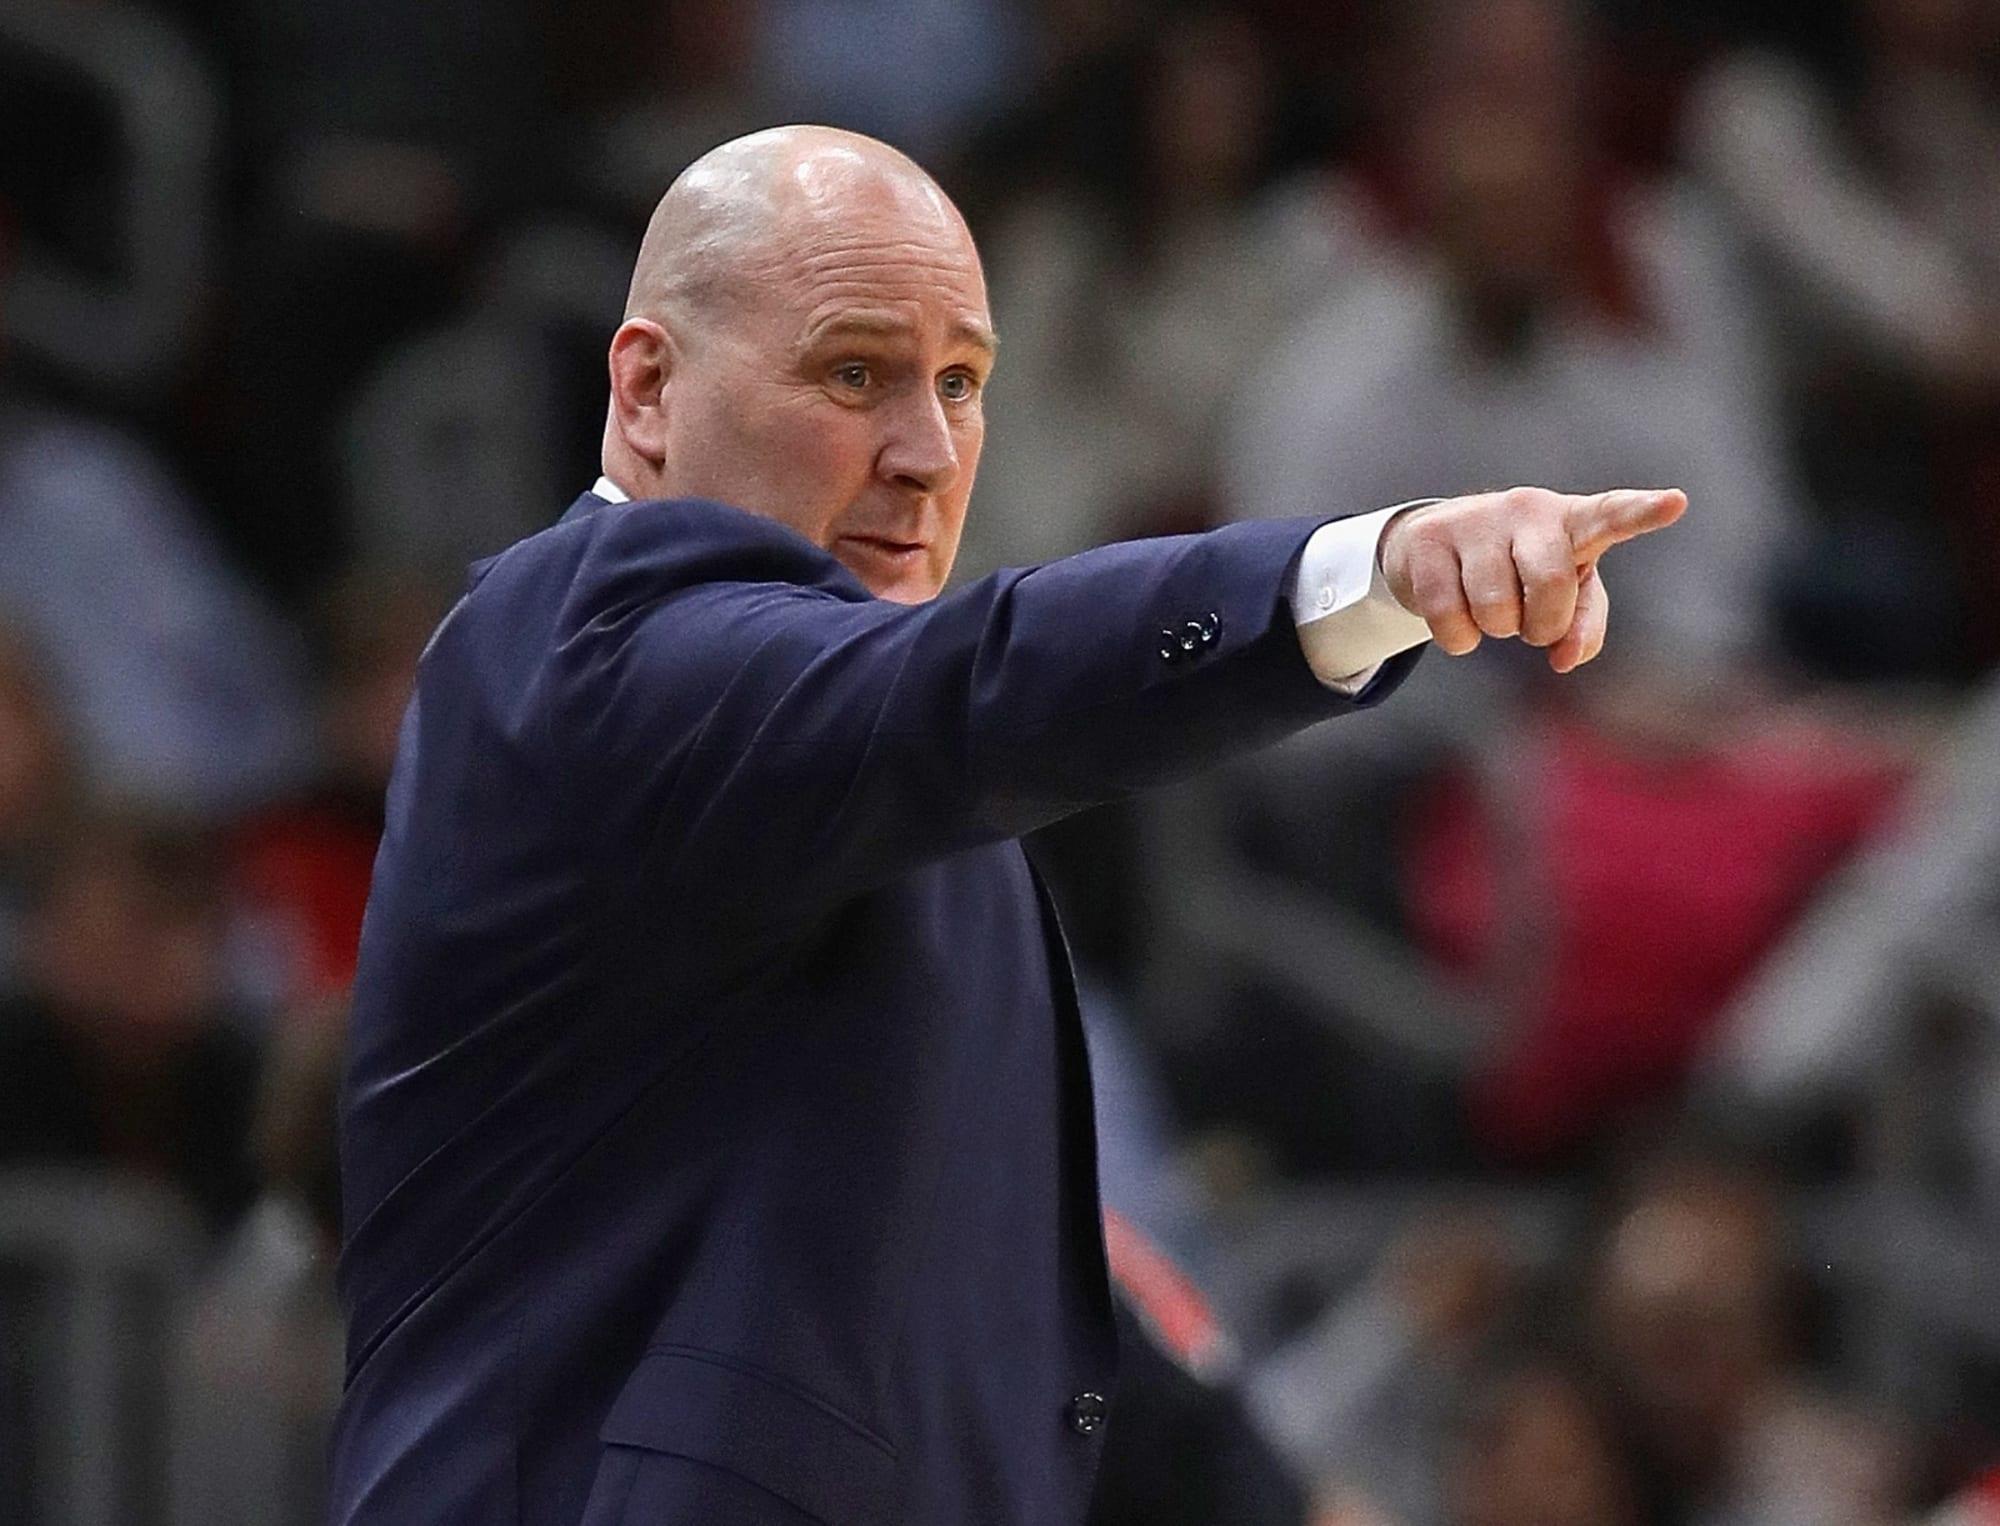 Get Ready for More Jim Boylen, Chicago Bulls Fans